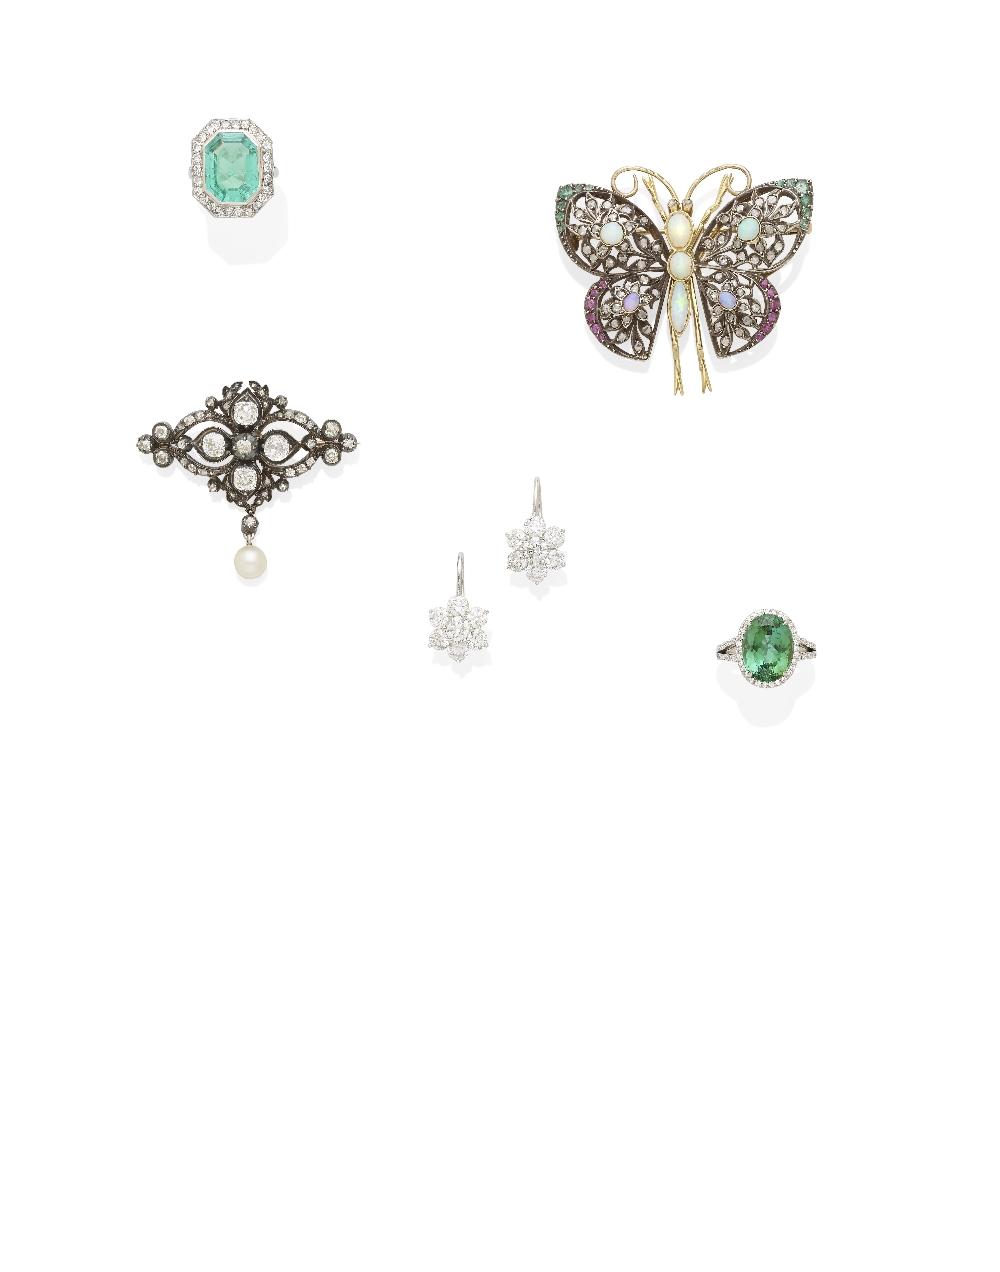 A green tourmaline and diamond ring, Tiffany & Co.